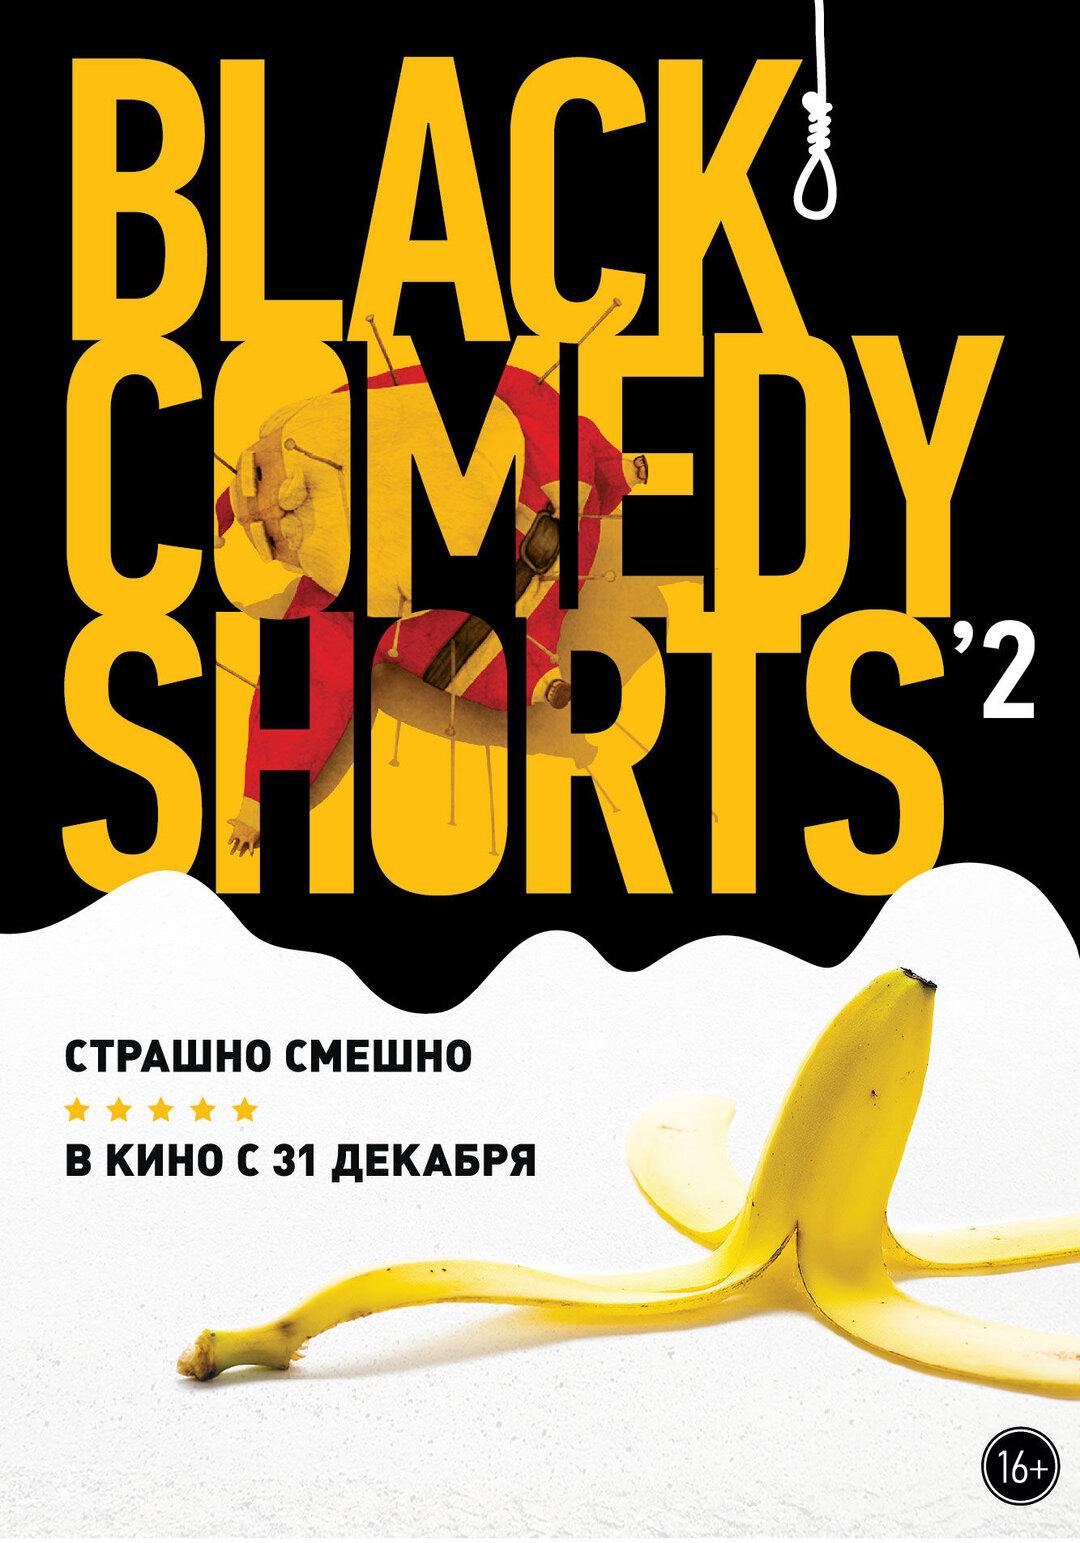 Black Comedy Shorts 2